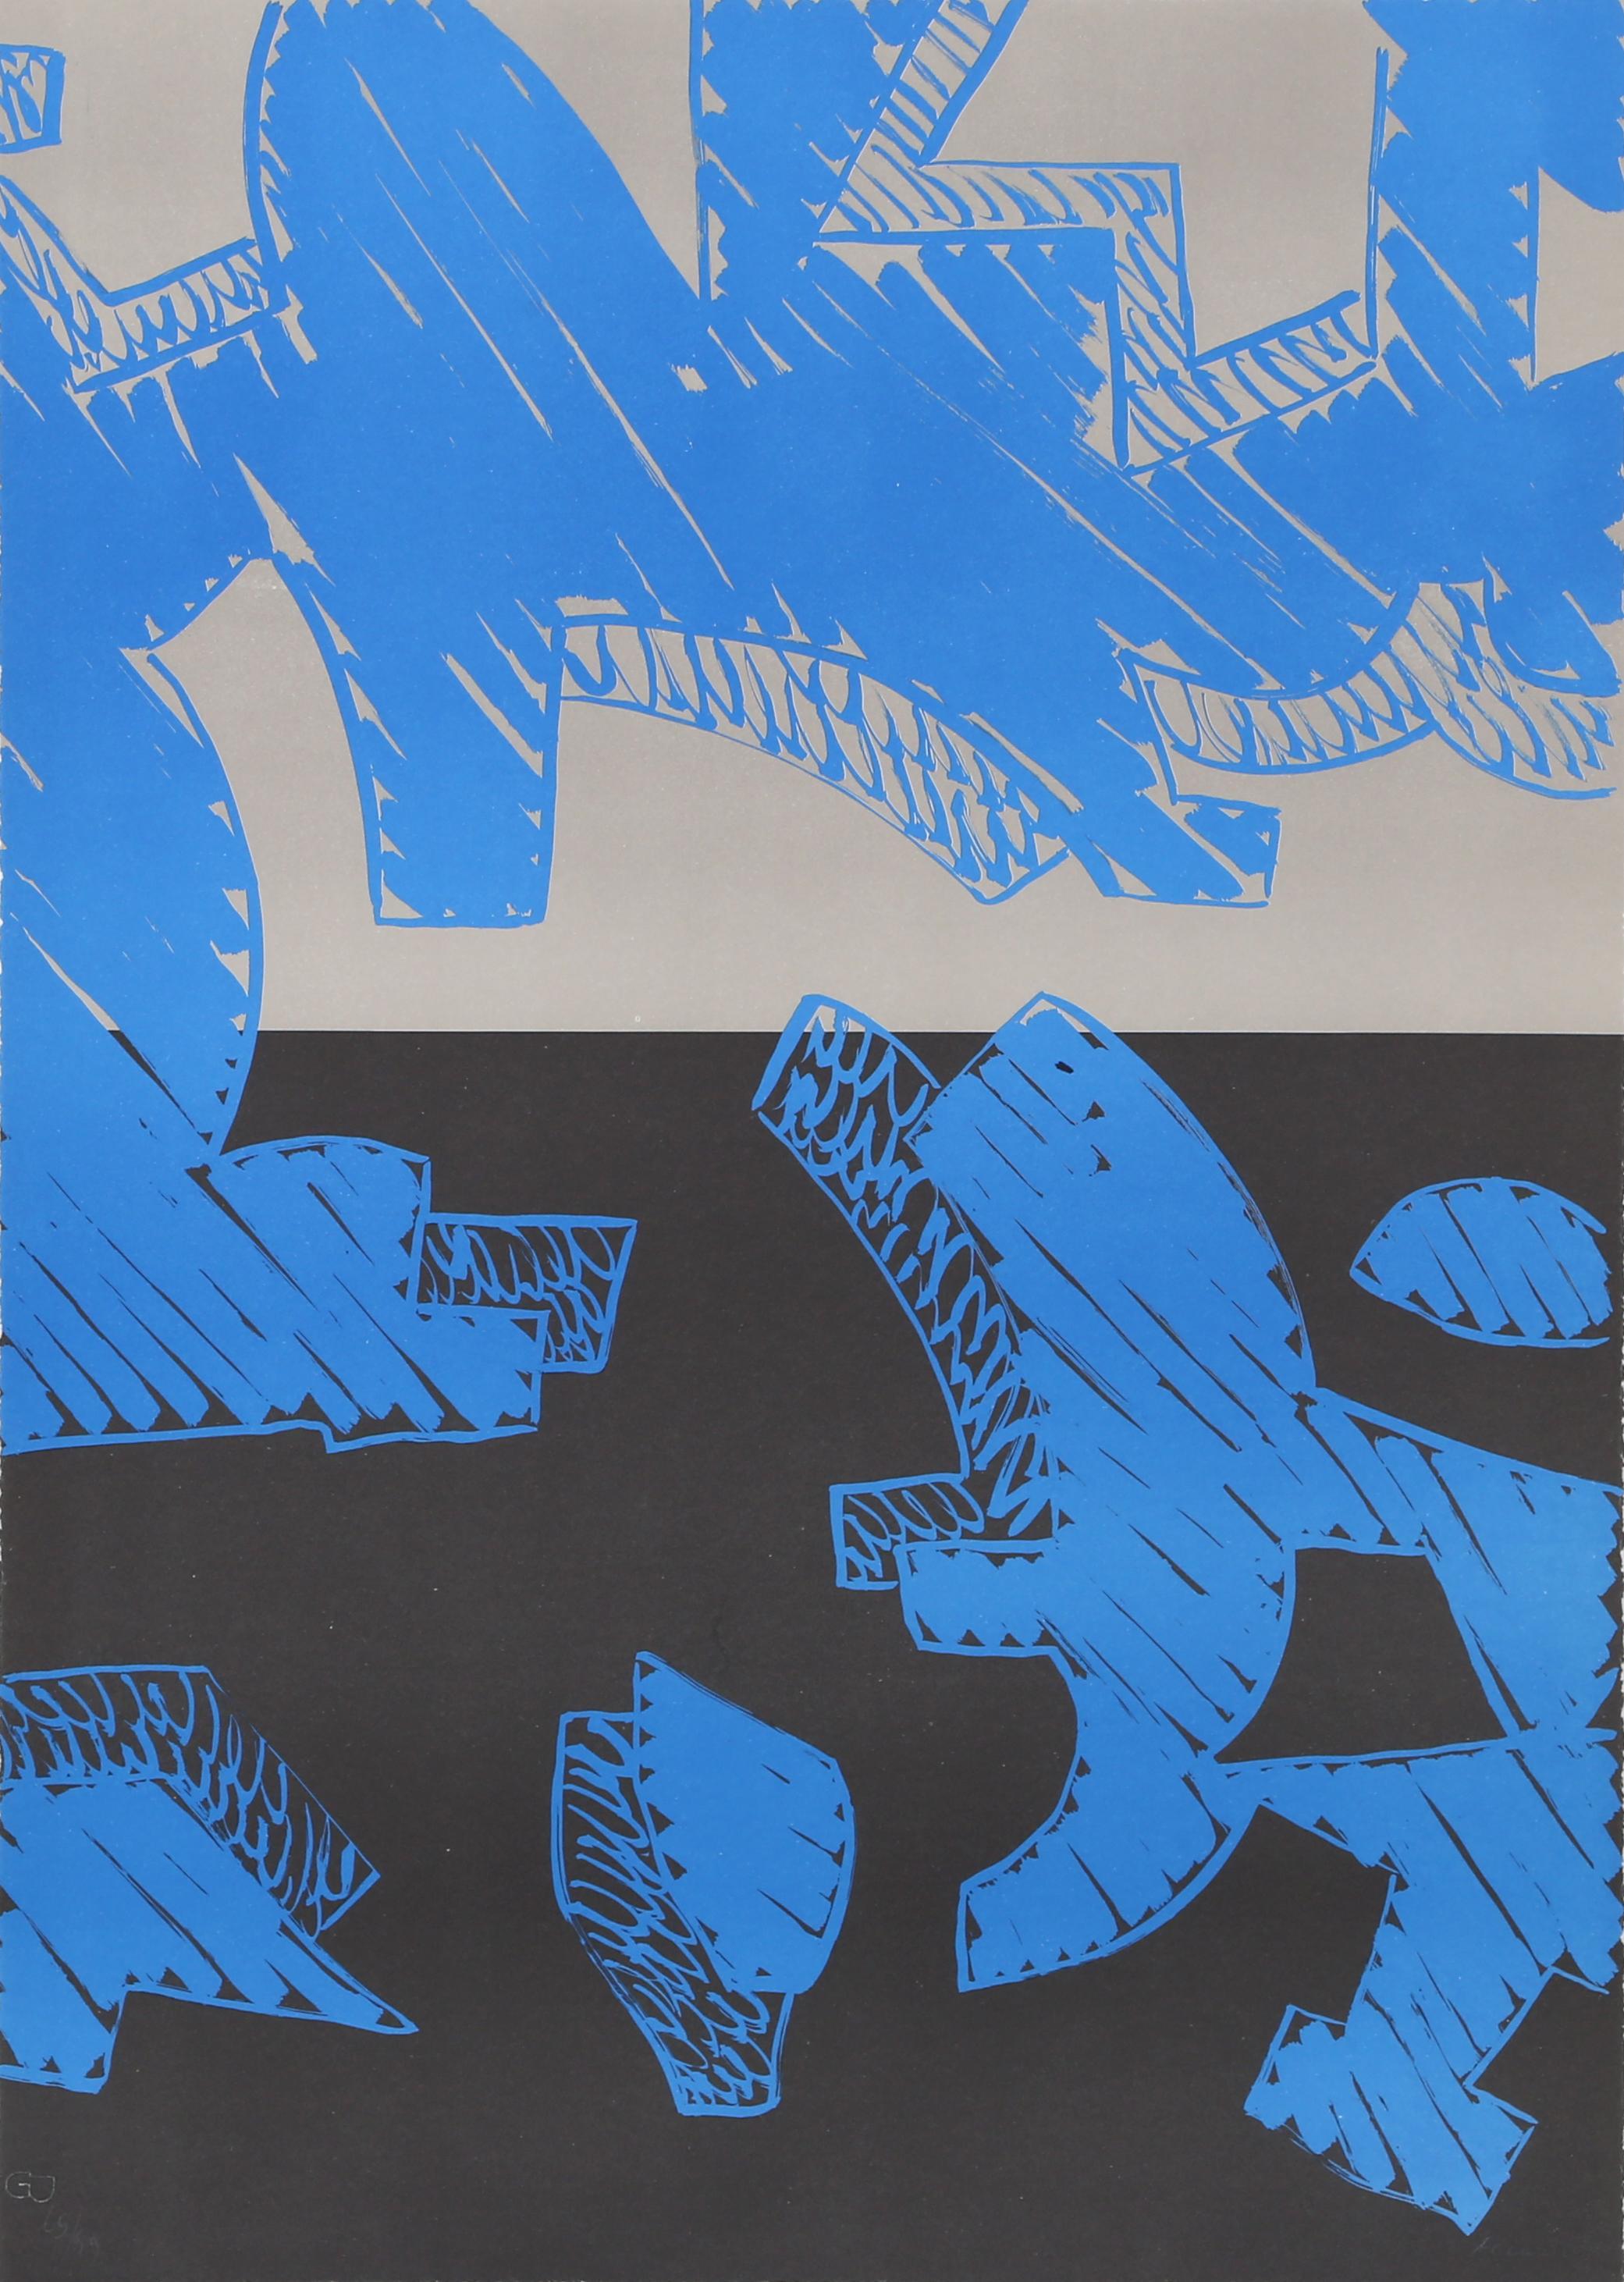 Blu, Lithography by Carla Accardi